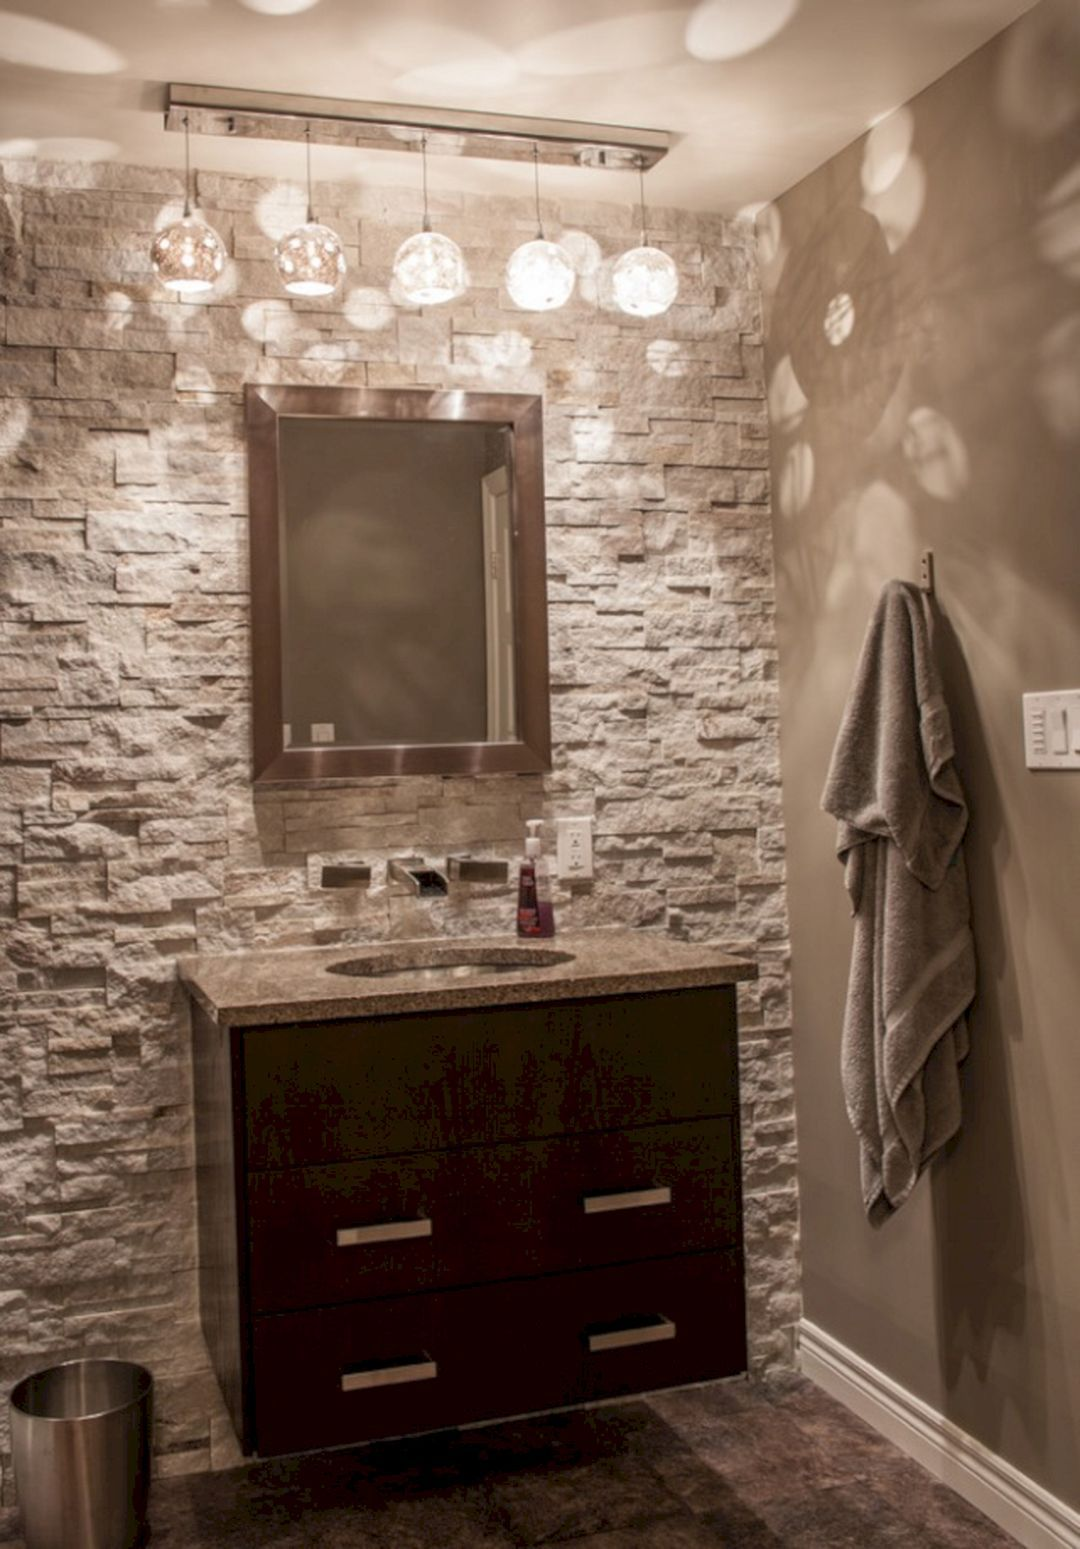 Epic 45 Amazing Rock Wall Bathroom You Need To Impersonate Https Decoredo Com 13316 45 Amazing Small Half Bathrooms Small Bathroom Remodel Powder Room Decor